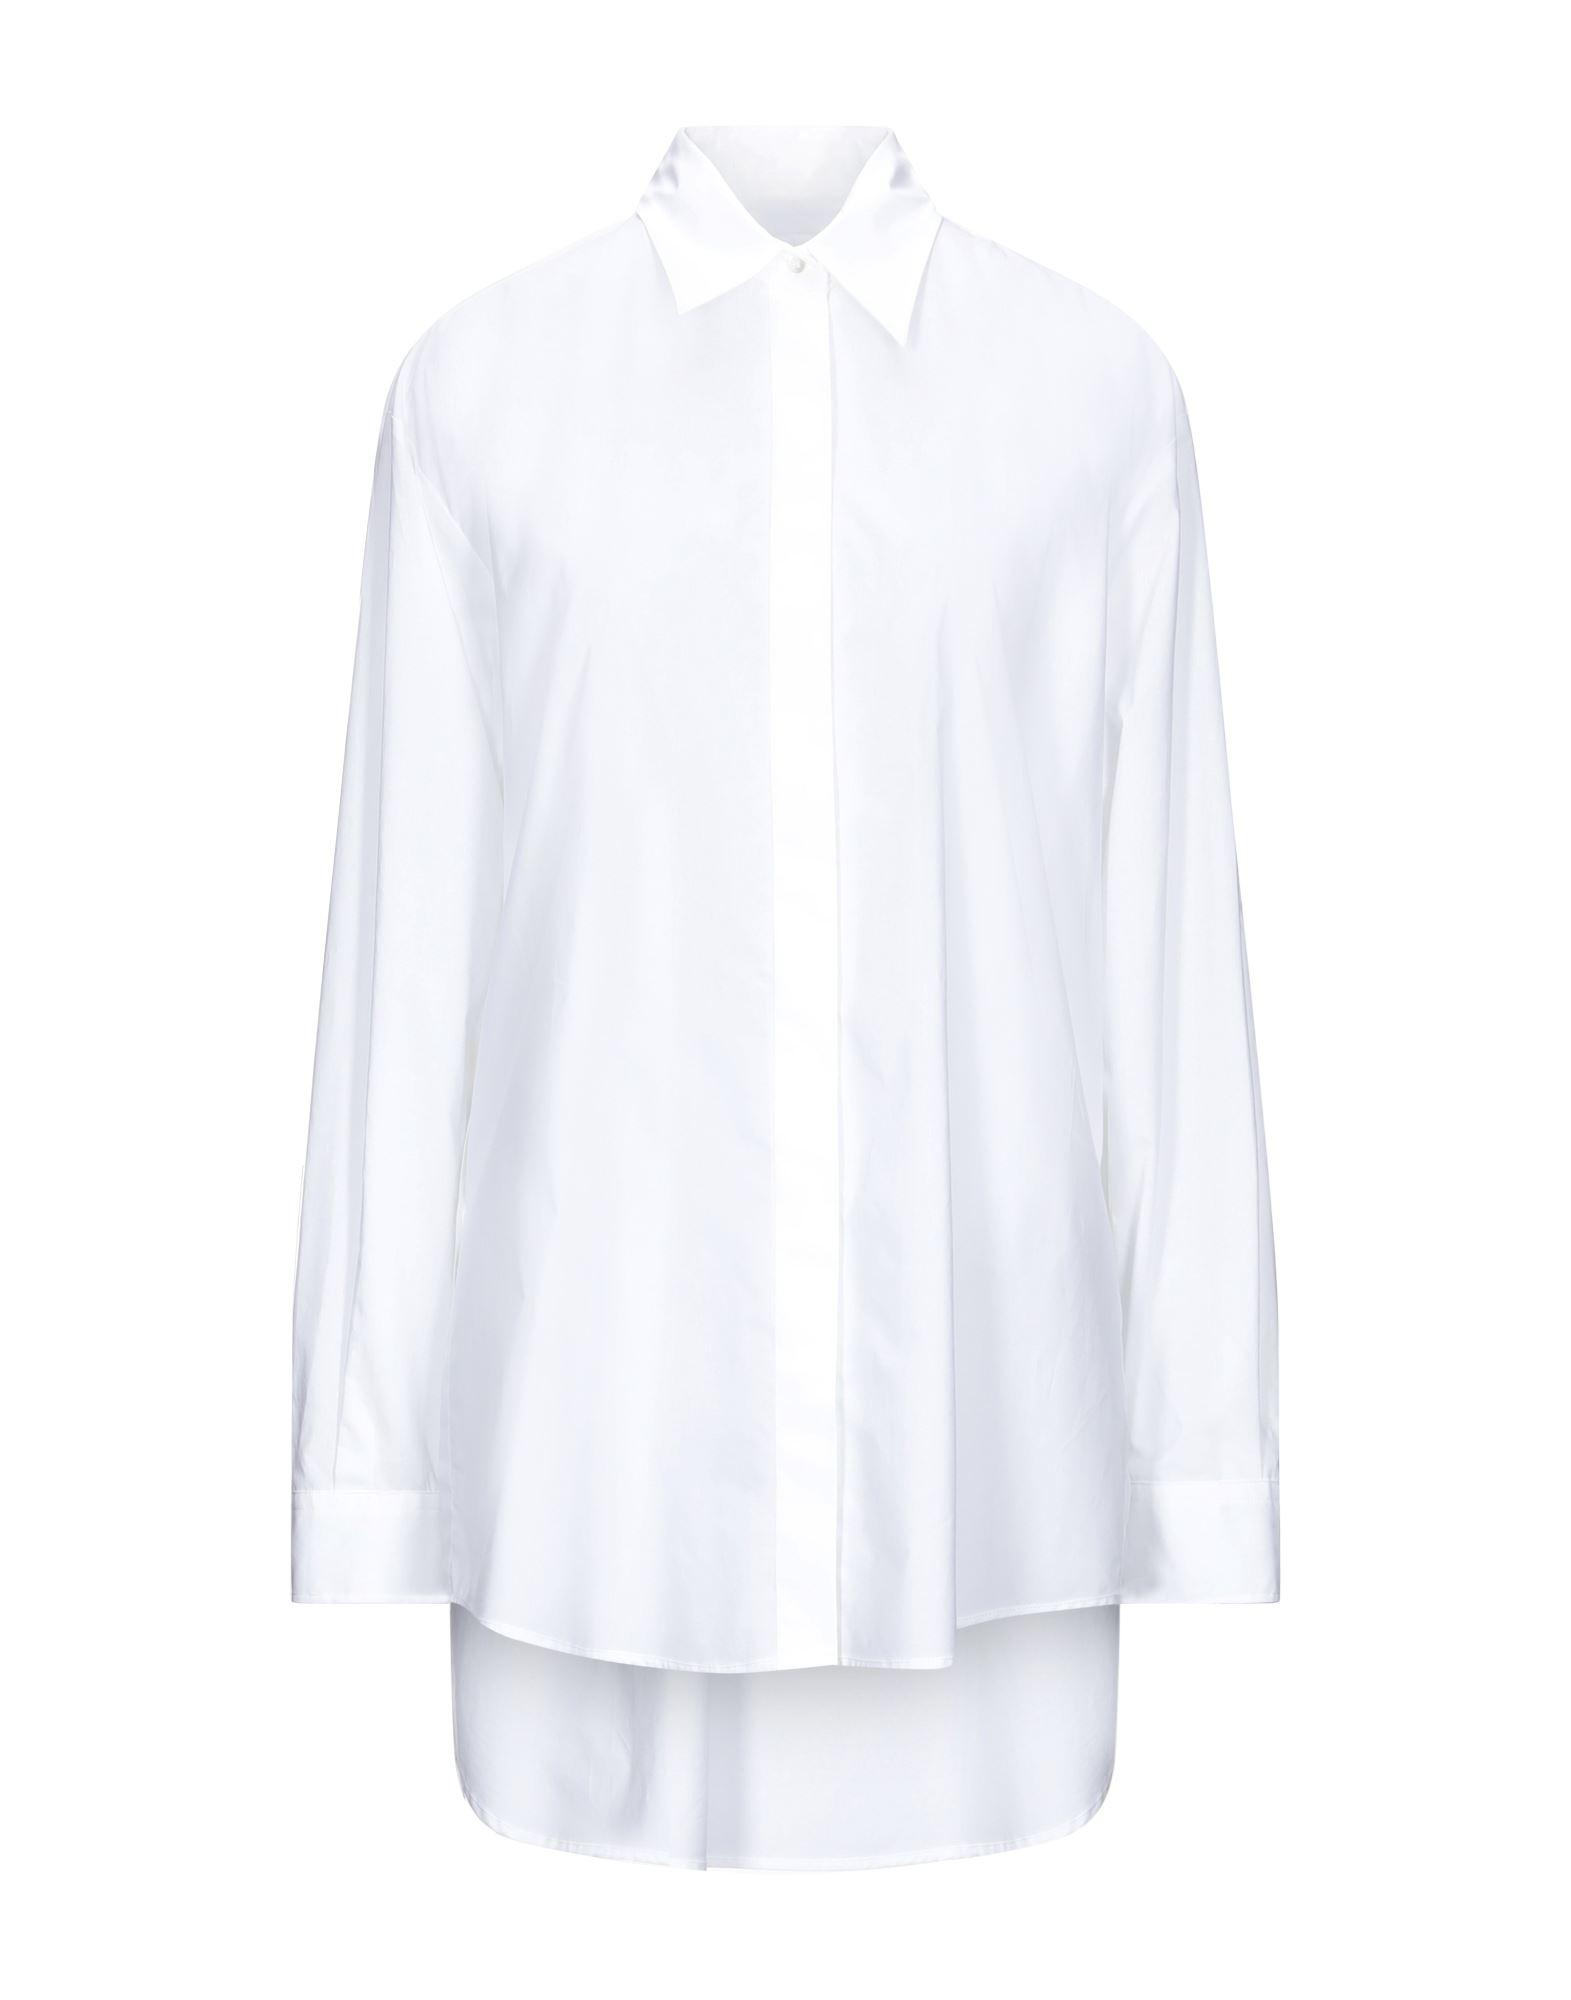 MM6 MAISON MARGIELA Shirts. plain weave, logo, print, basic solid color, long sleeves, buttoned cuffs, lapel collar, no pockets. 100% Cotton